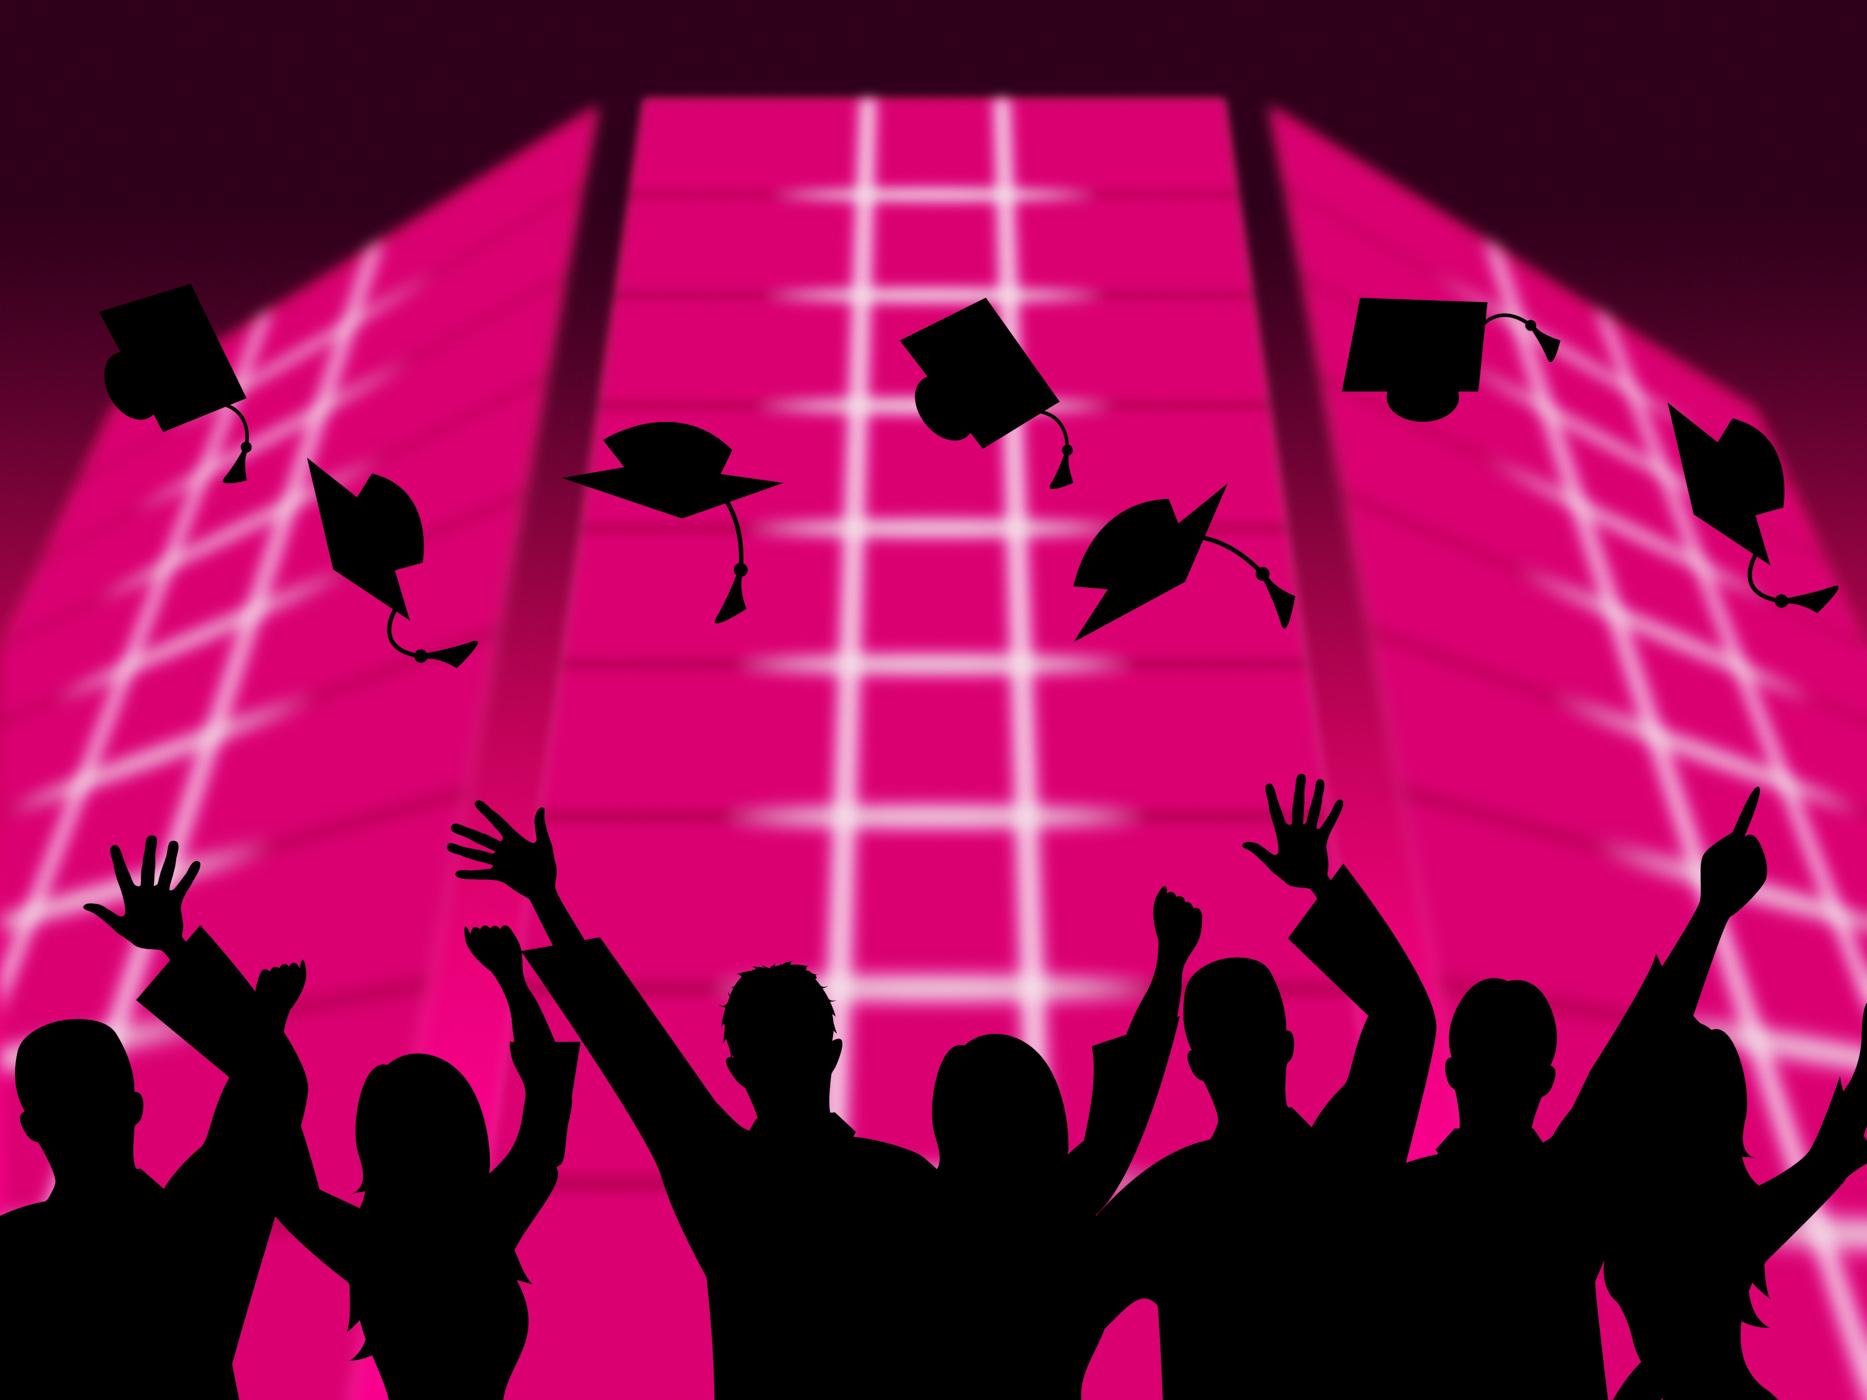 Education Graduation Shows Educating Graduates And Graduate, Achievement, Studying, Studies, Steps, HQ Photo